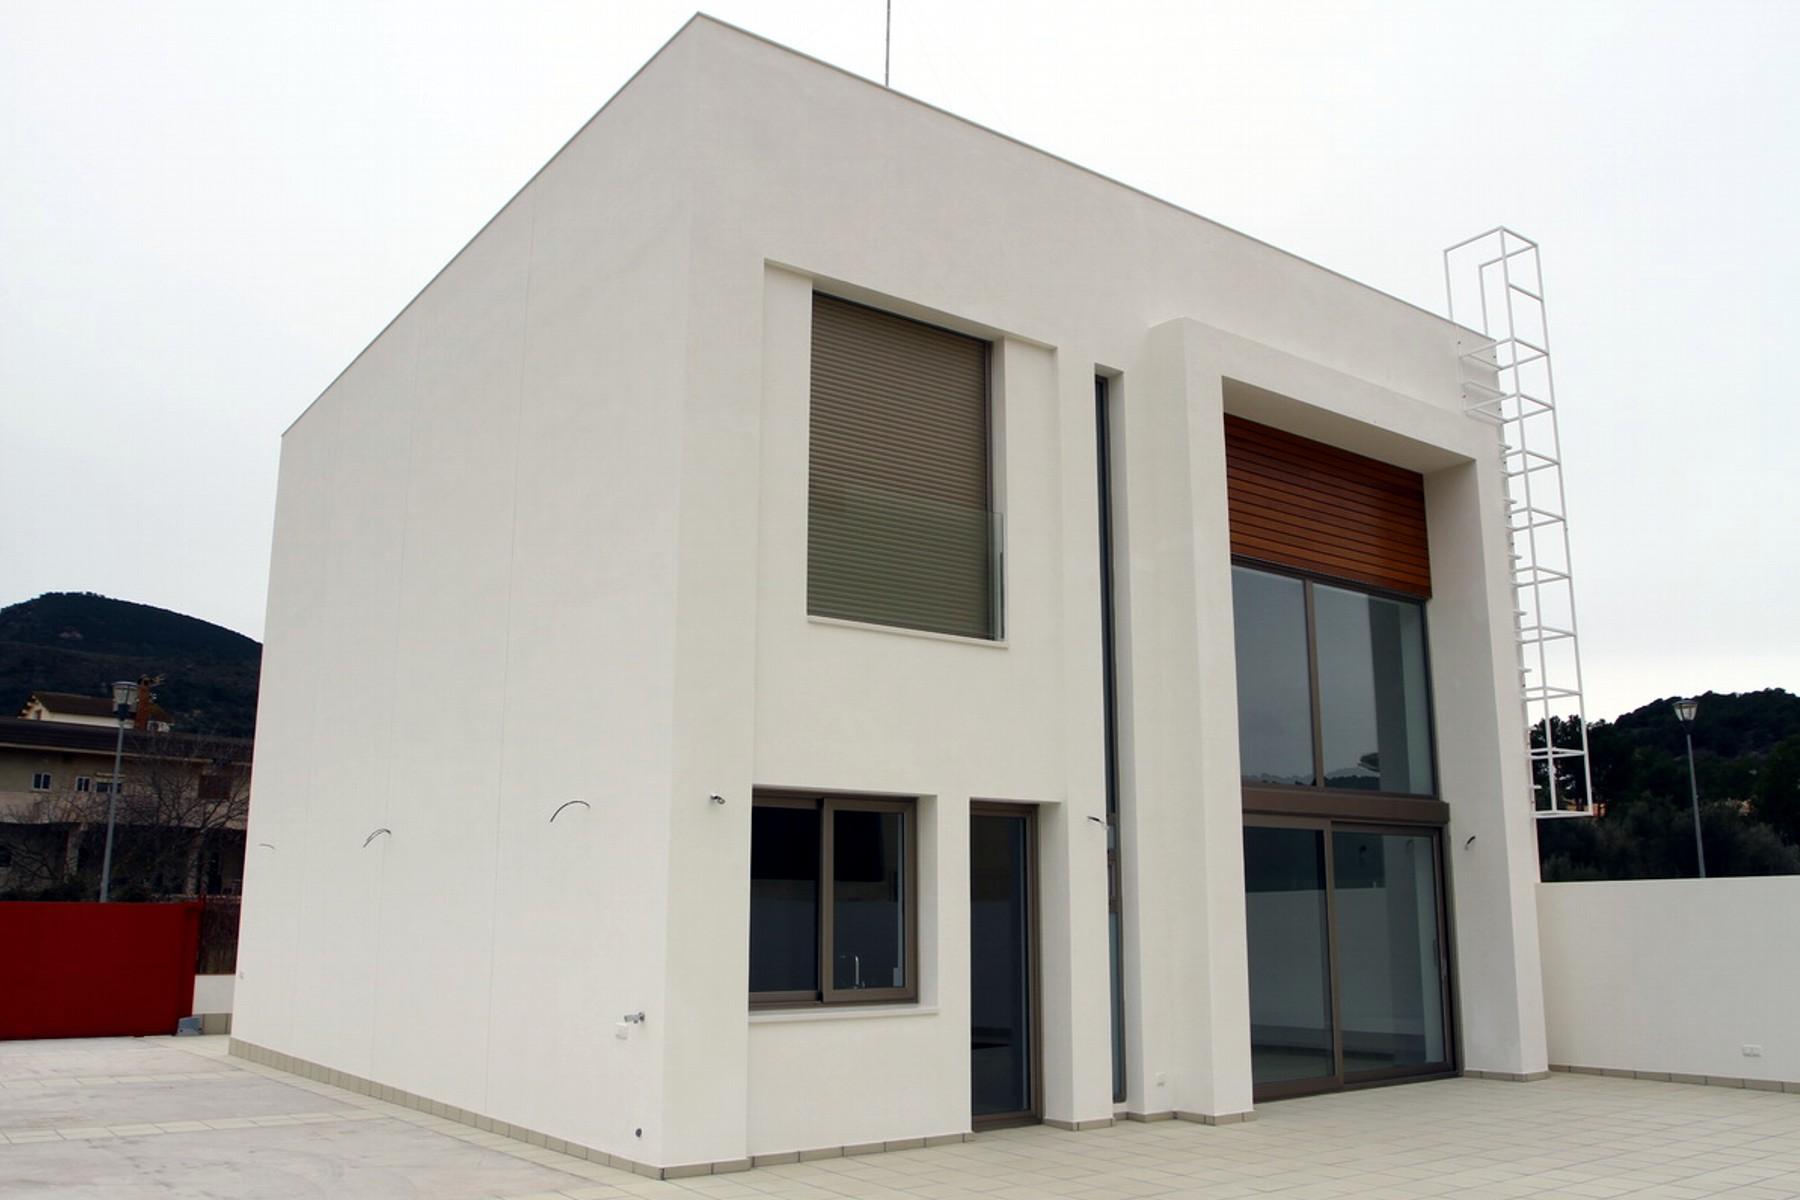 Imaginarq-349-Vivienda-Unifamiliar-Estivella-Valencia-7bA